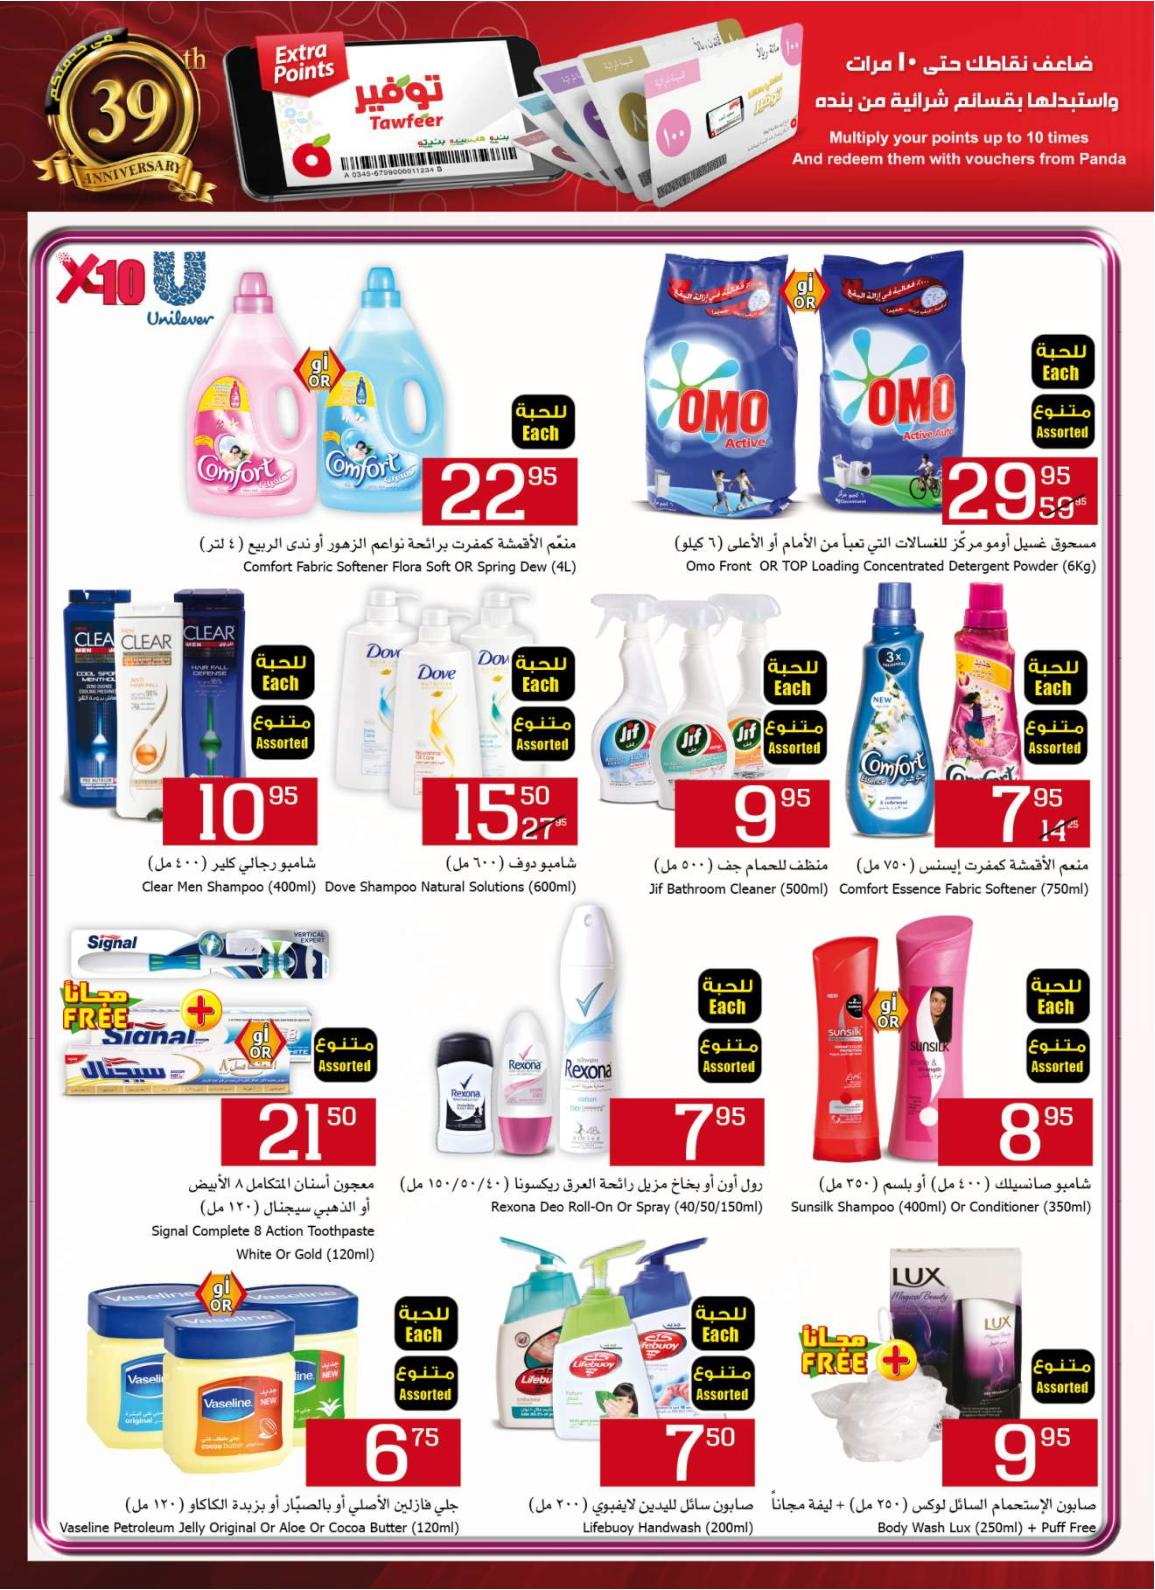 20171005 Hp Jeddah Calameo Downloader Vaseline Petroleum Jelly Arab 120ml Page 21